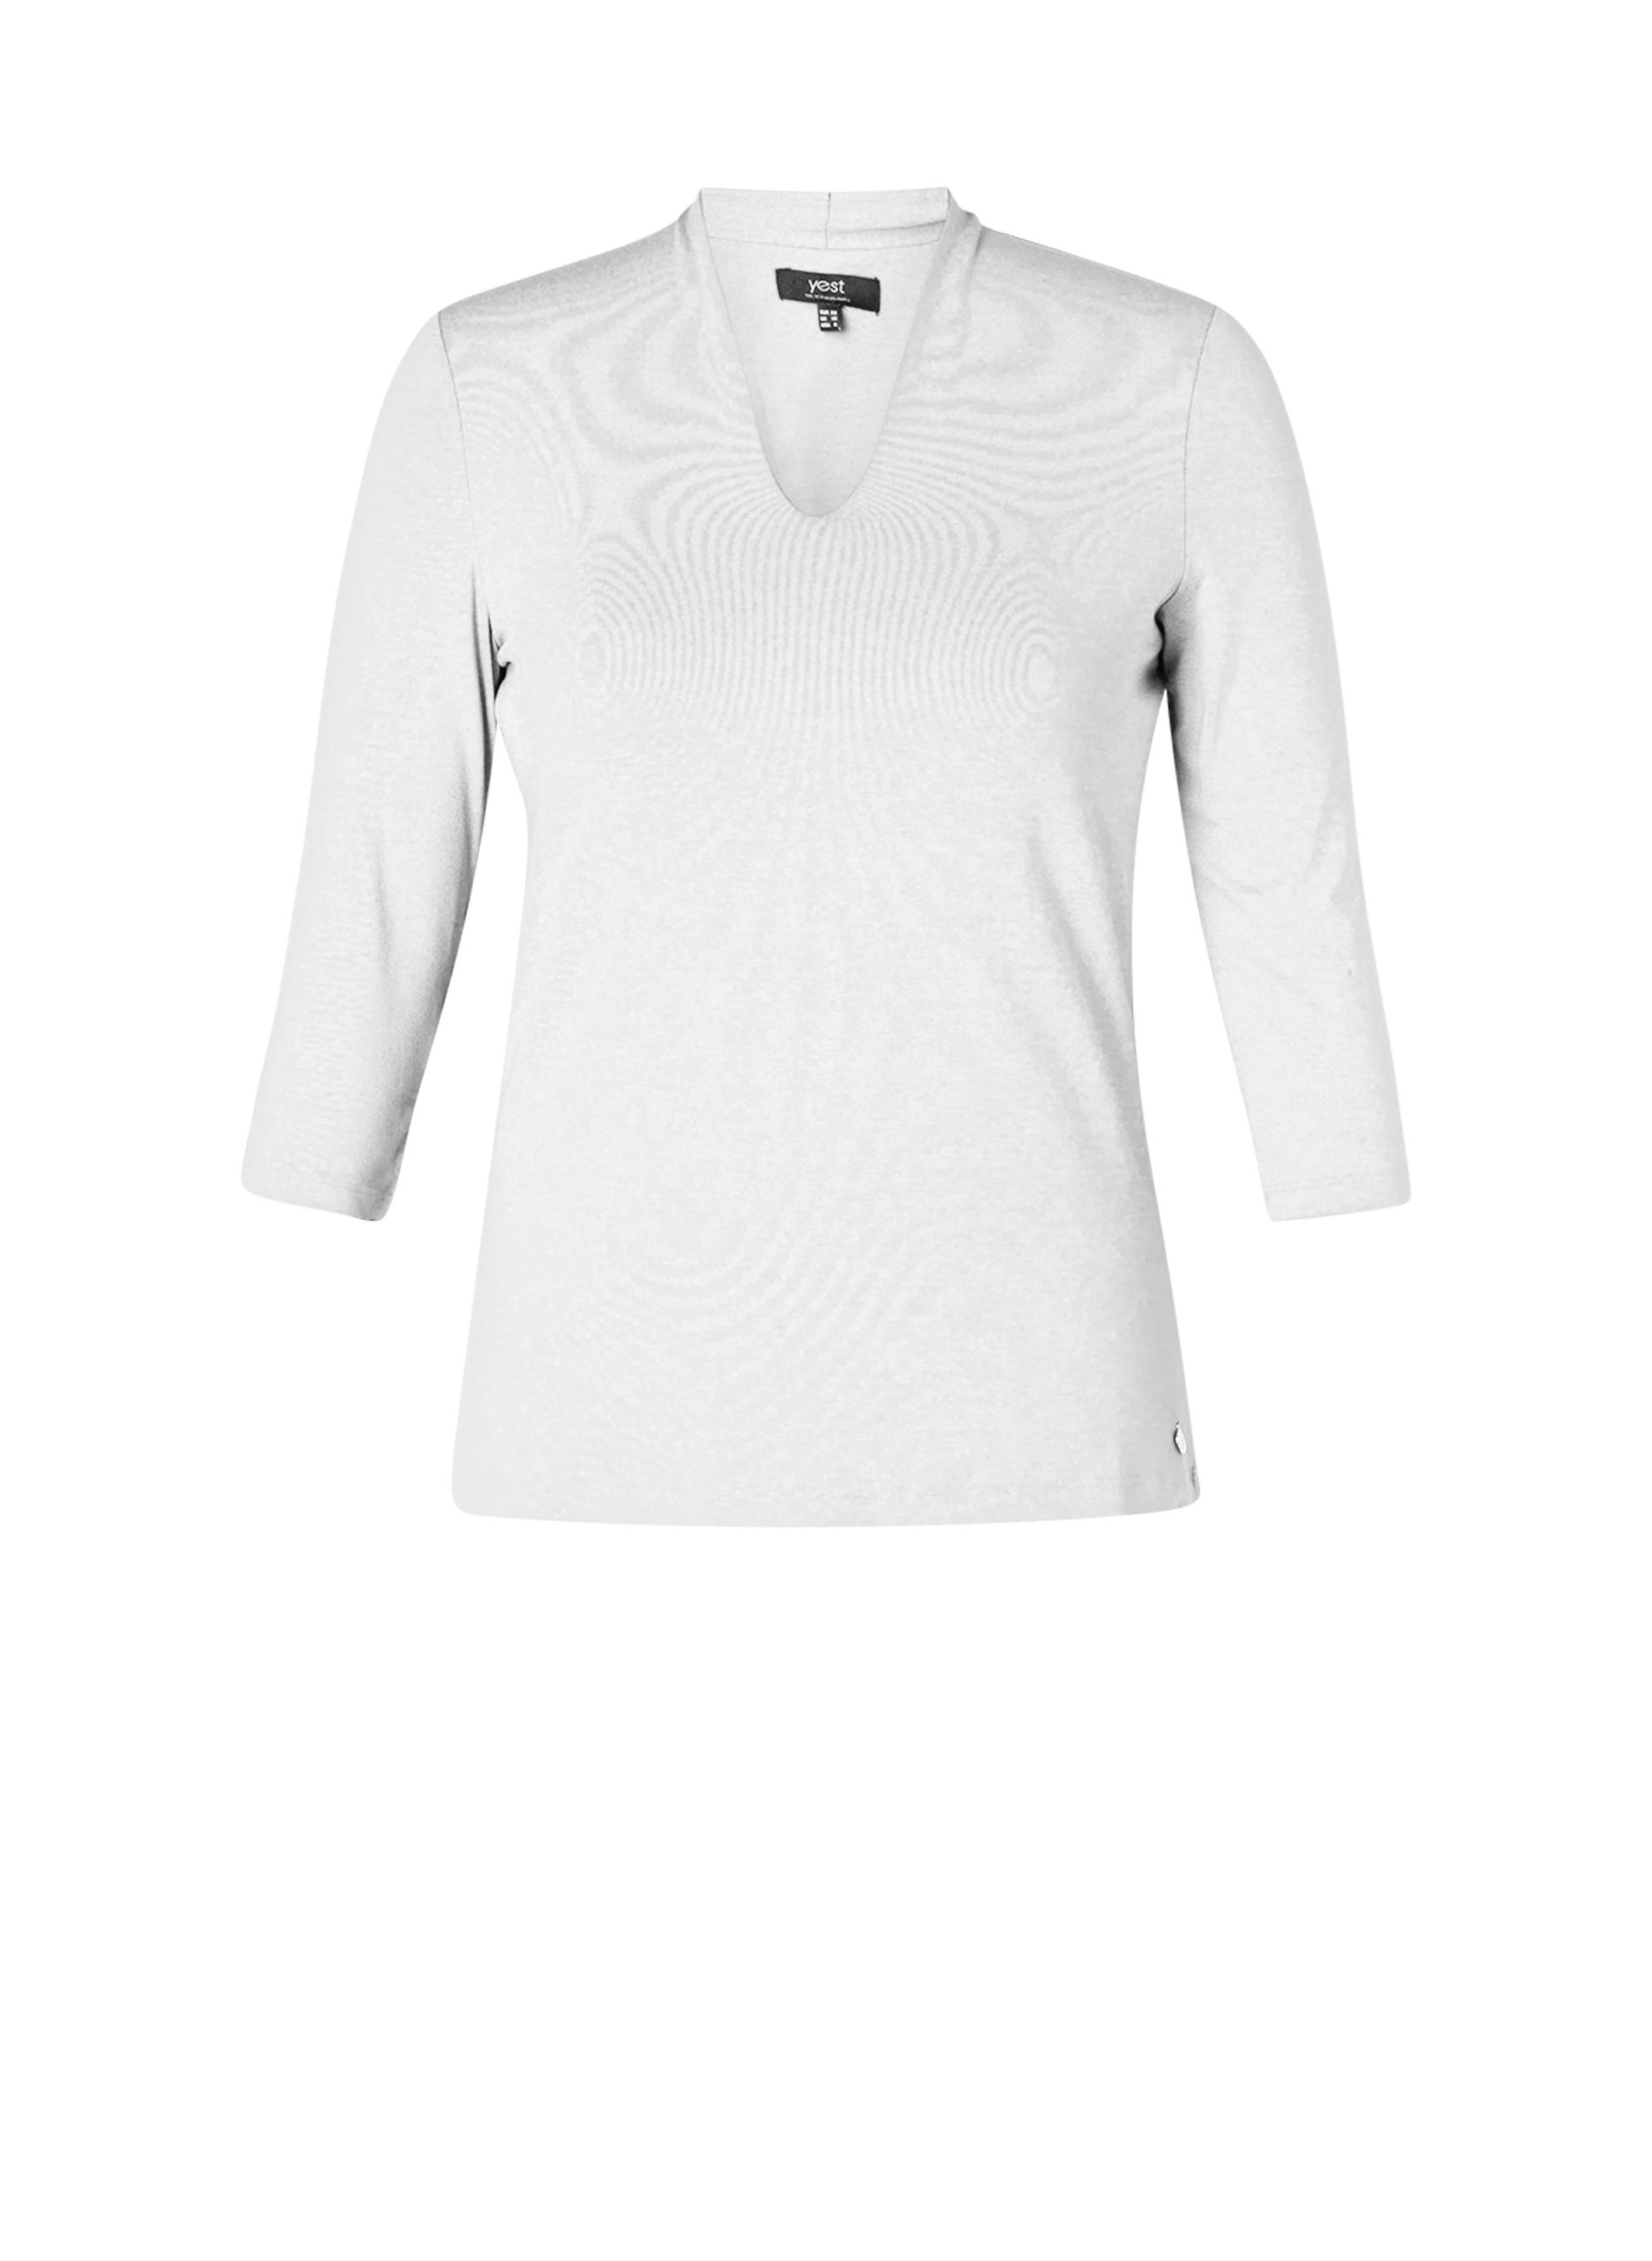 Yest Shirt Guido 64 cm